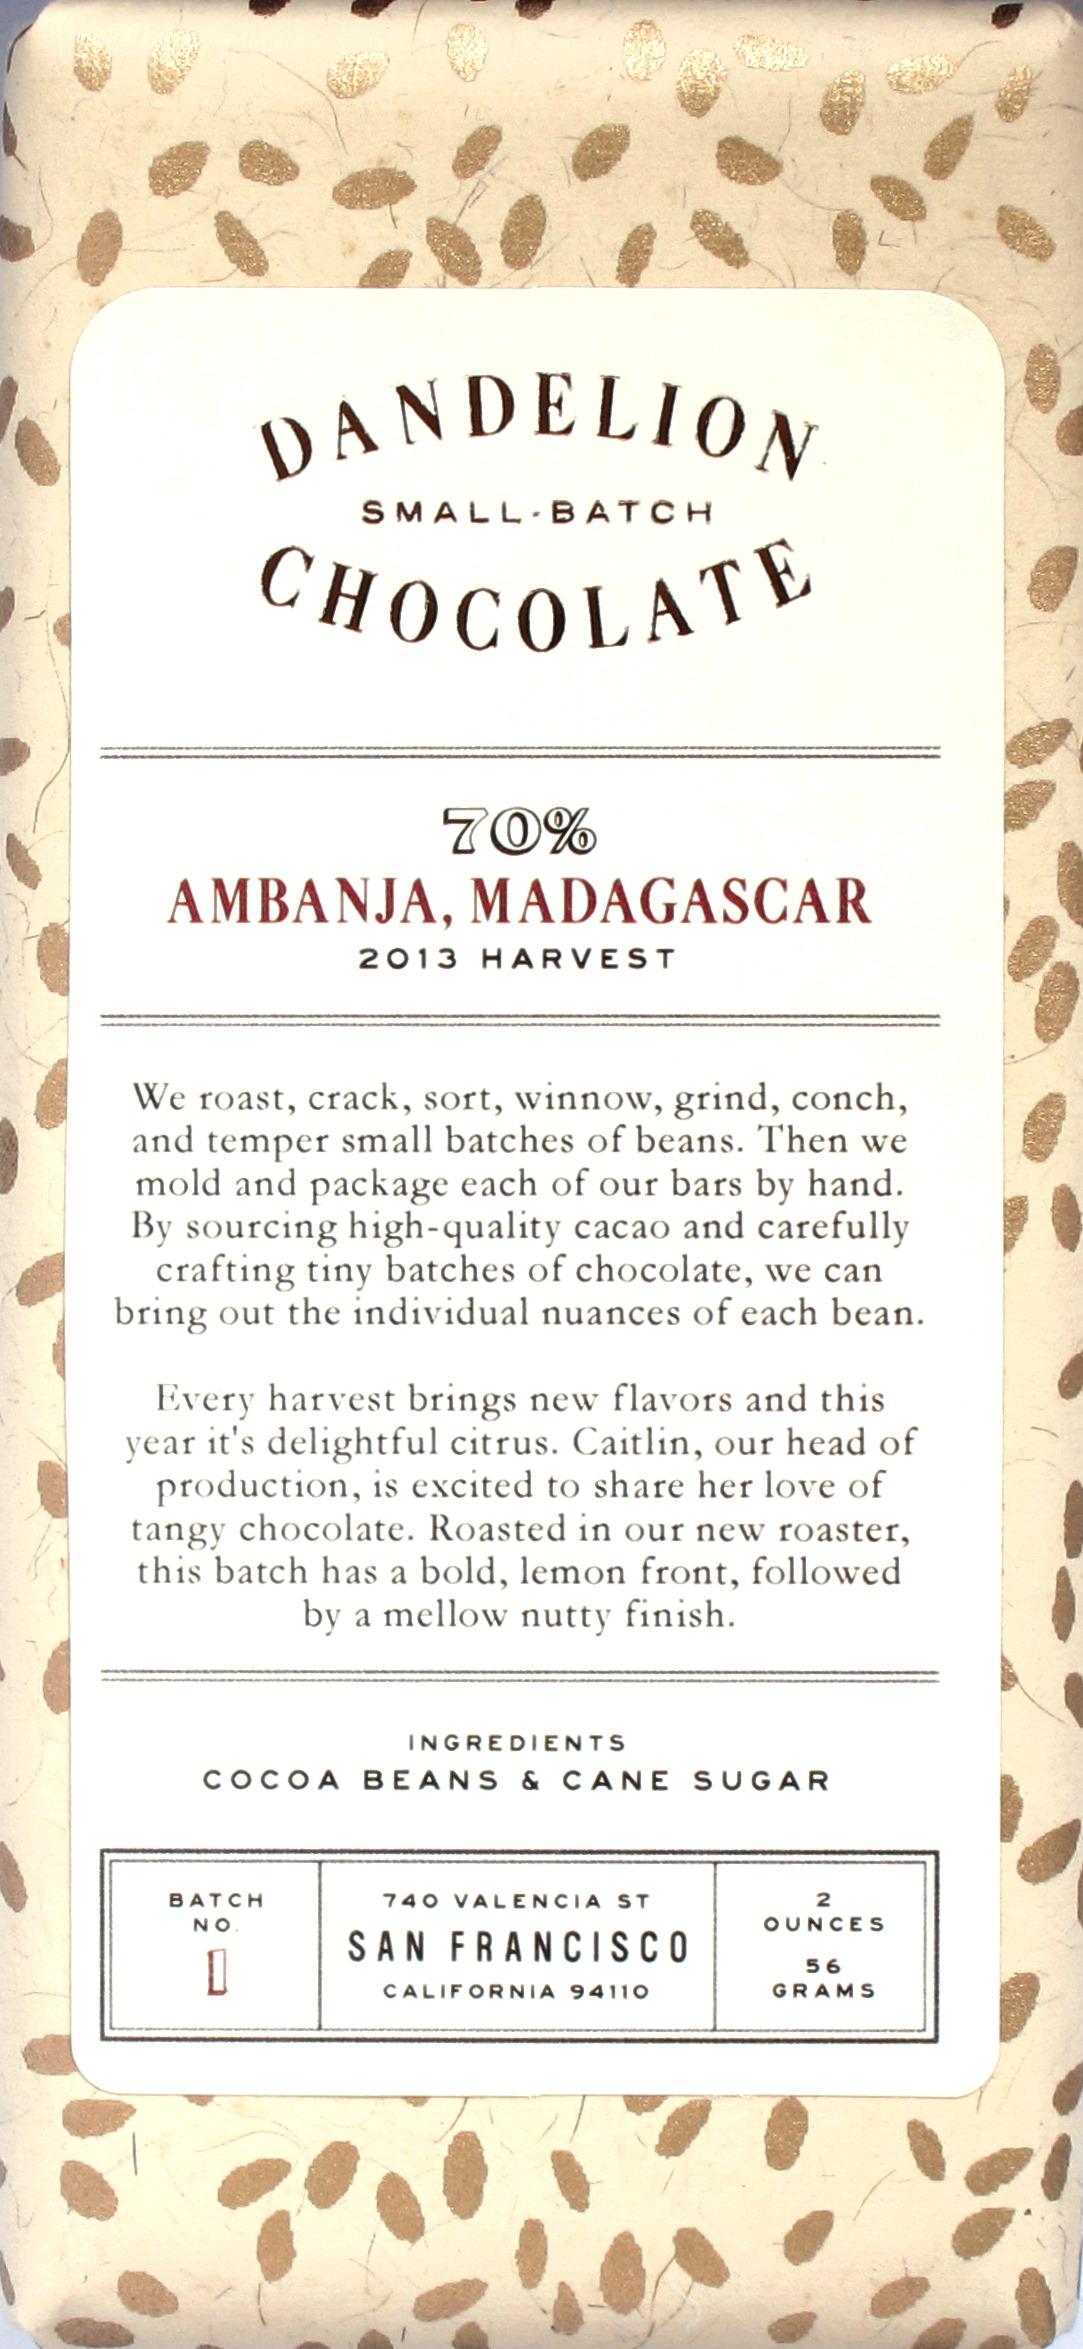 Dandelion Chocolate: Ambanja Madagascar, 70%-Schokolade, 2013